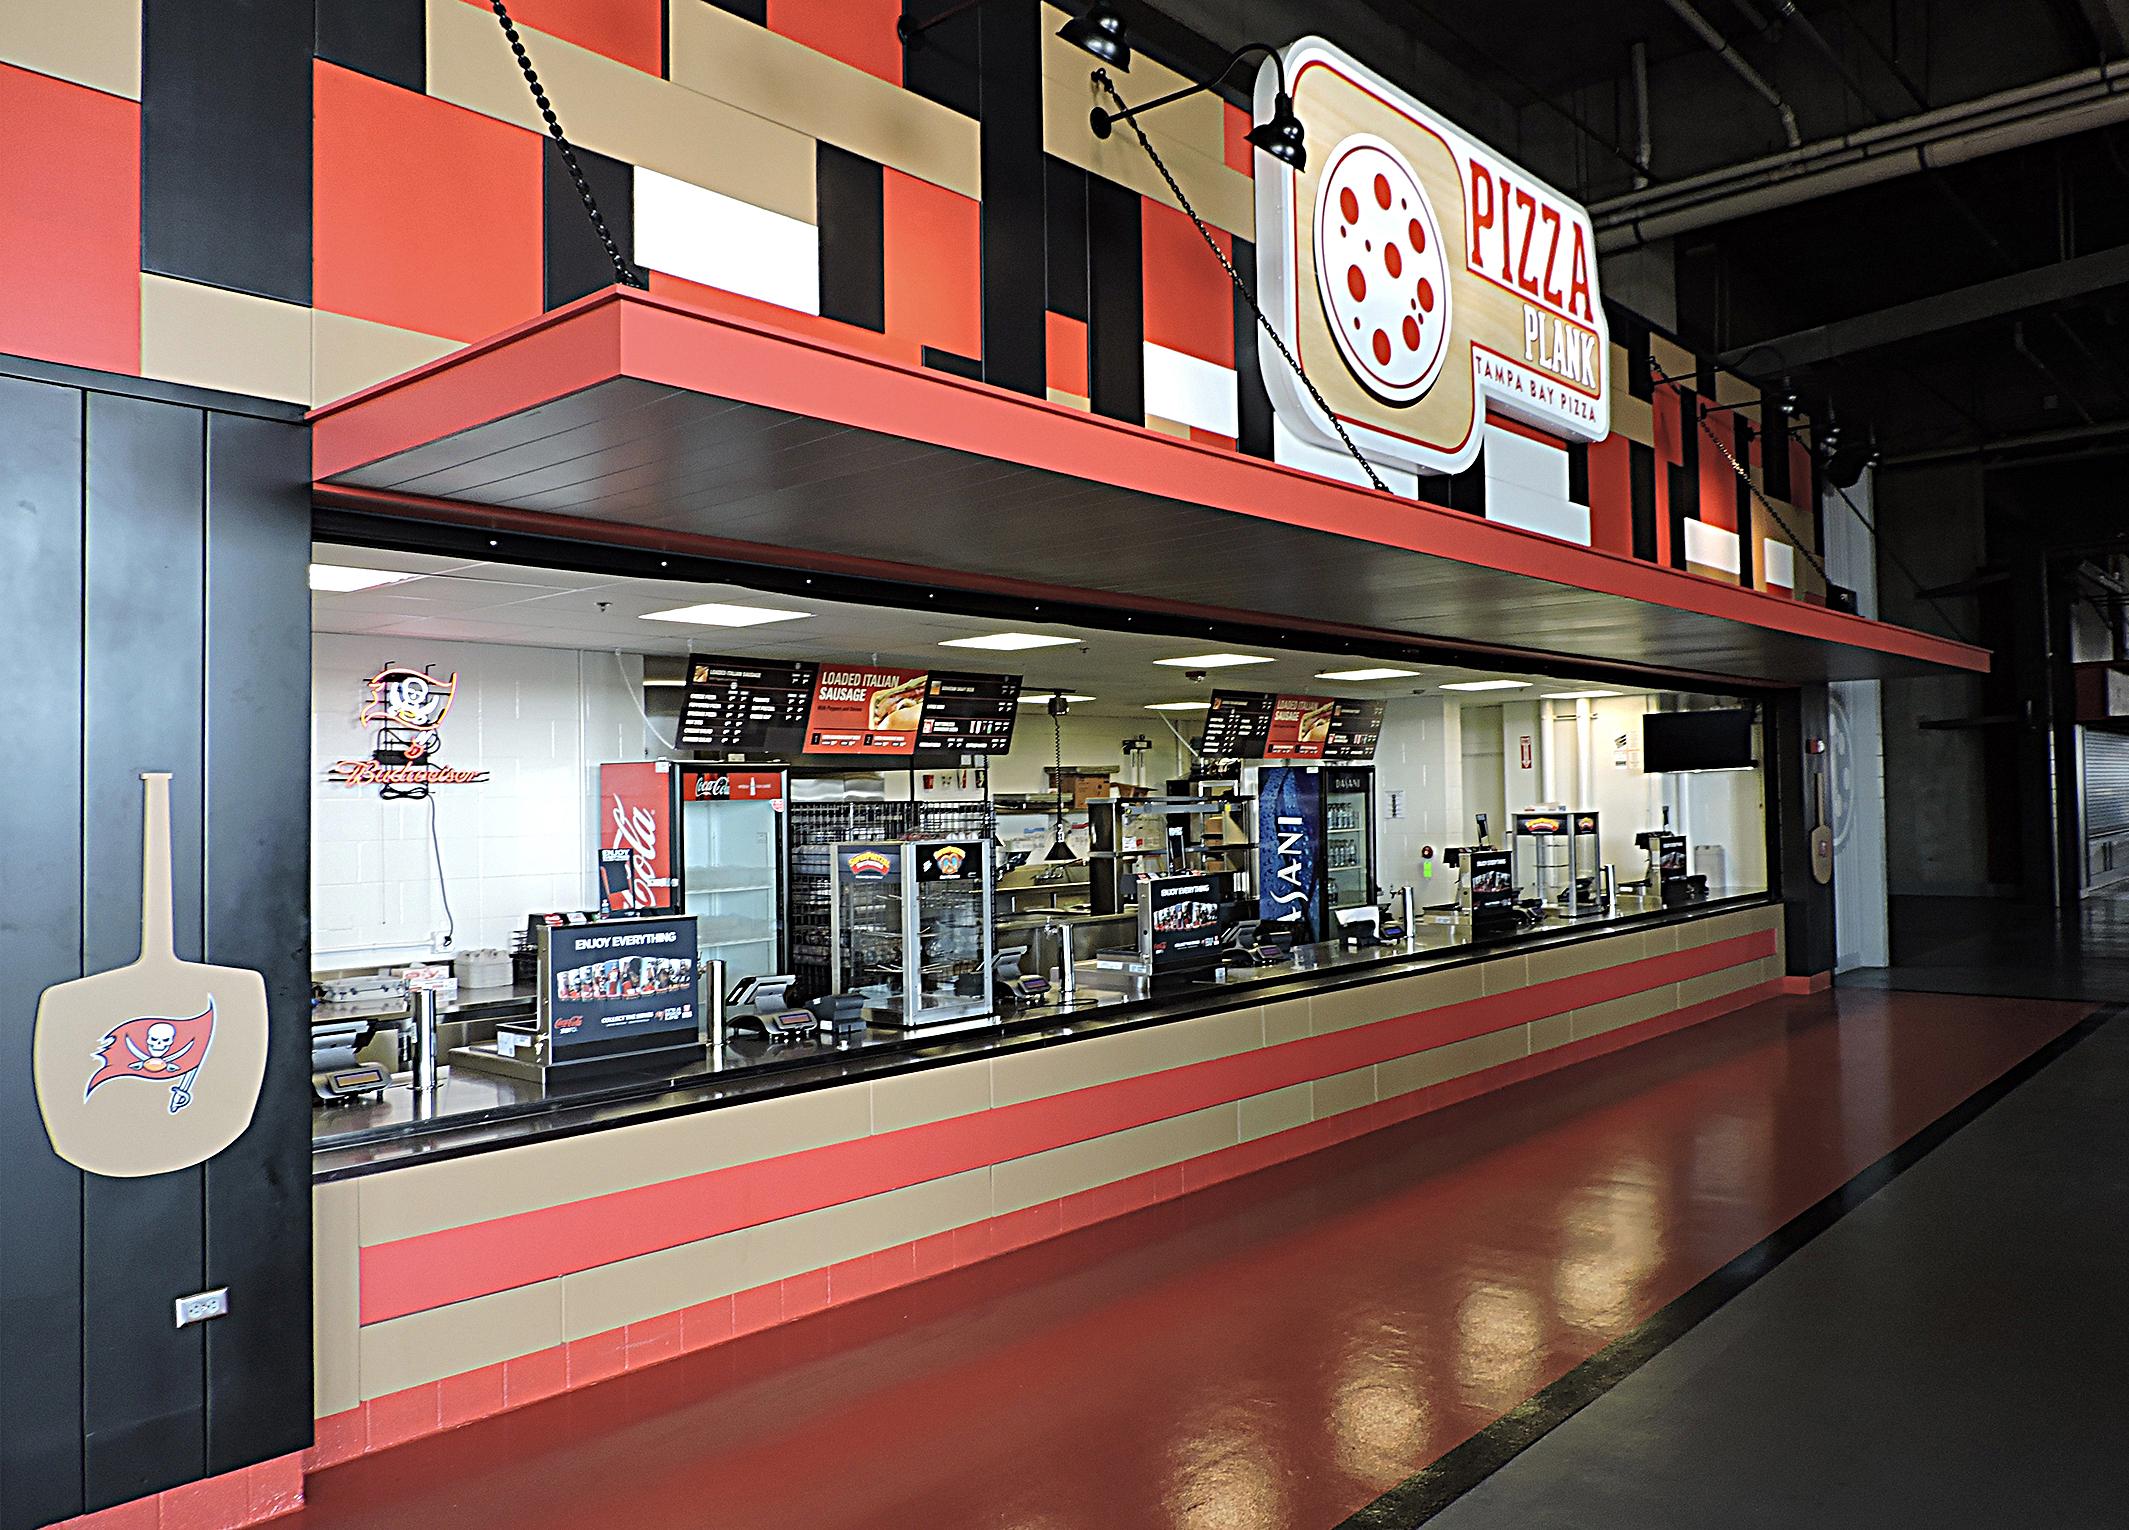 retail-pizza planck 1.jpg